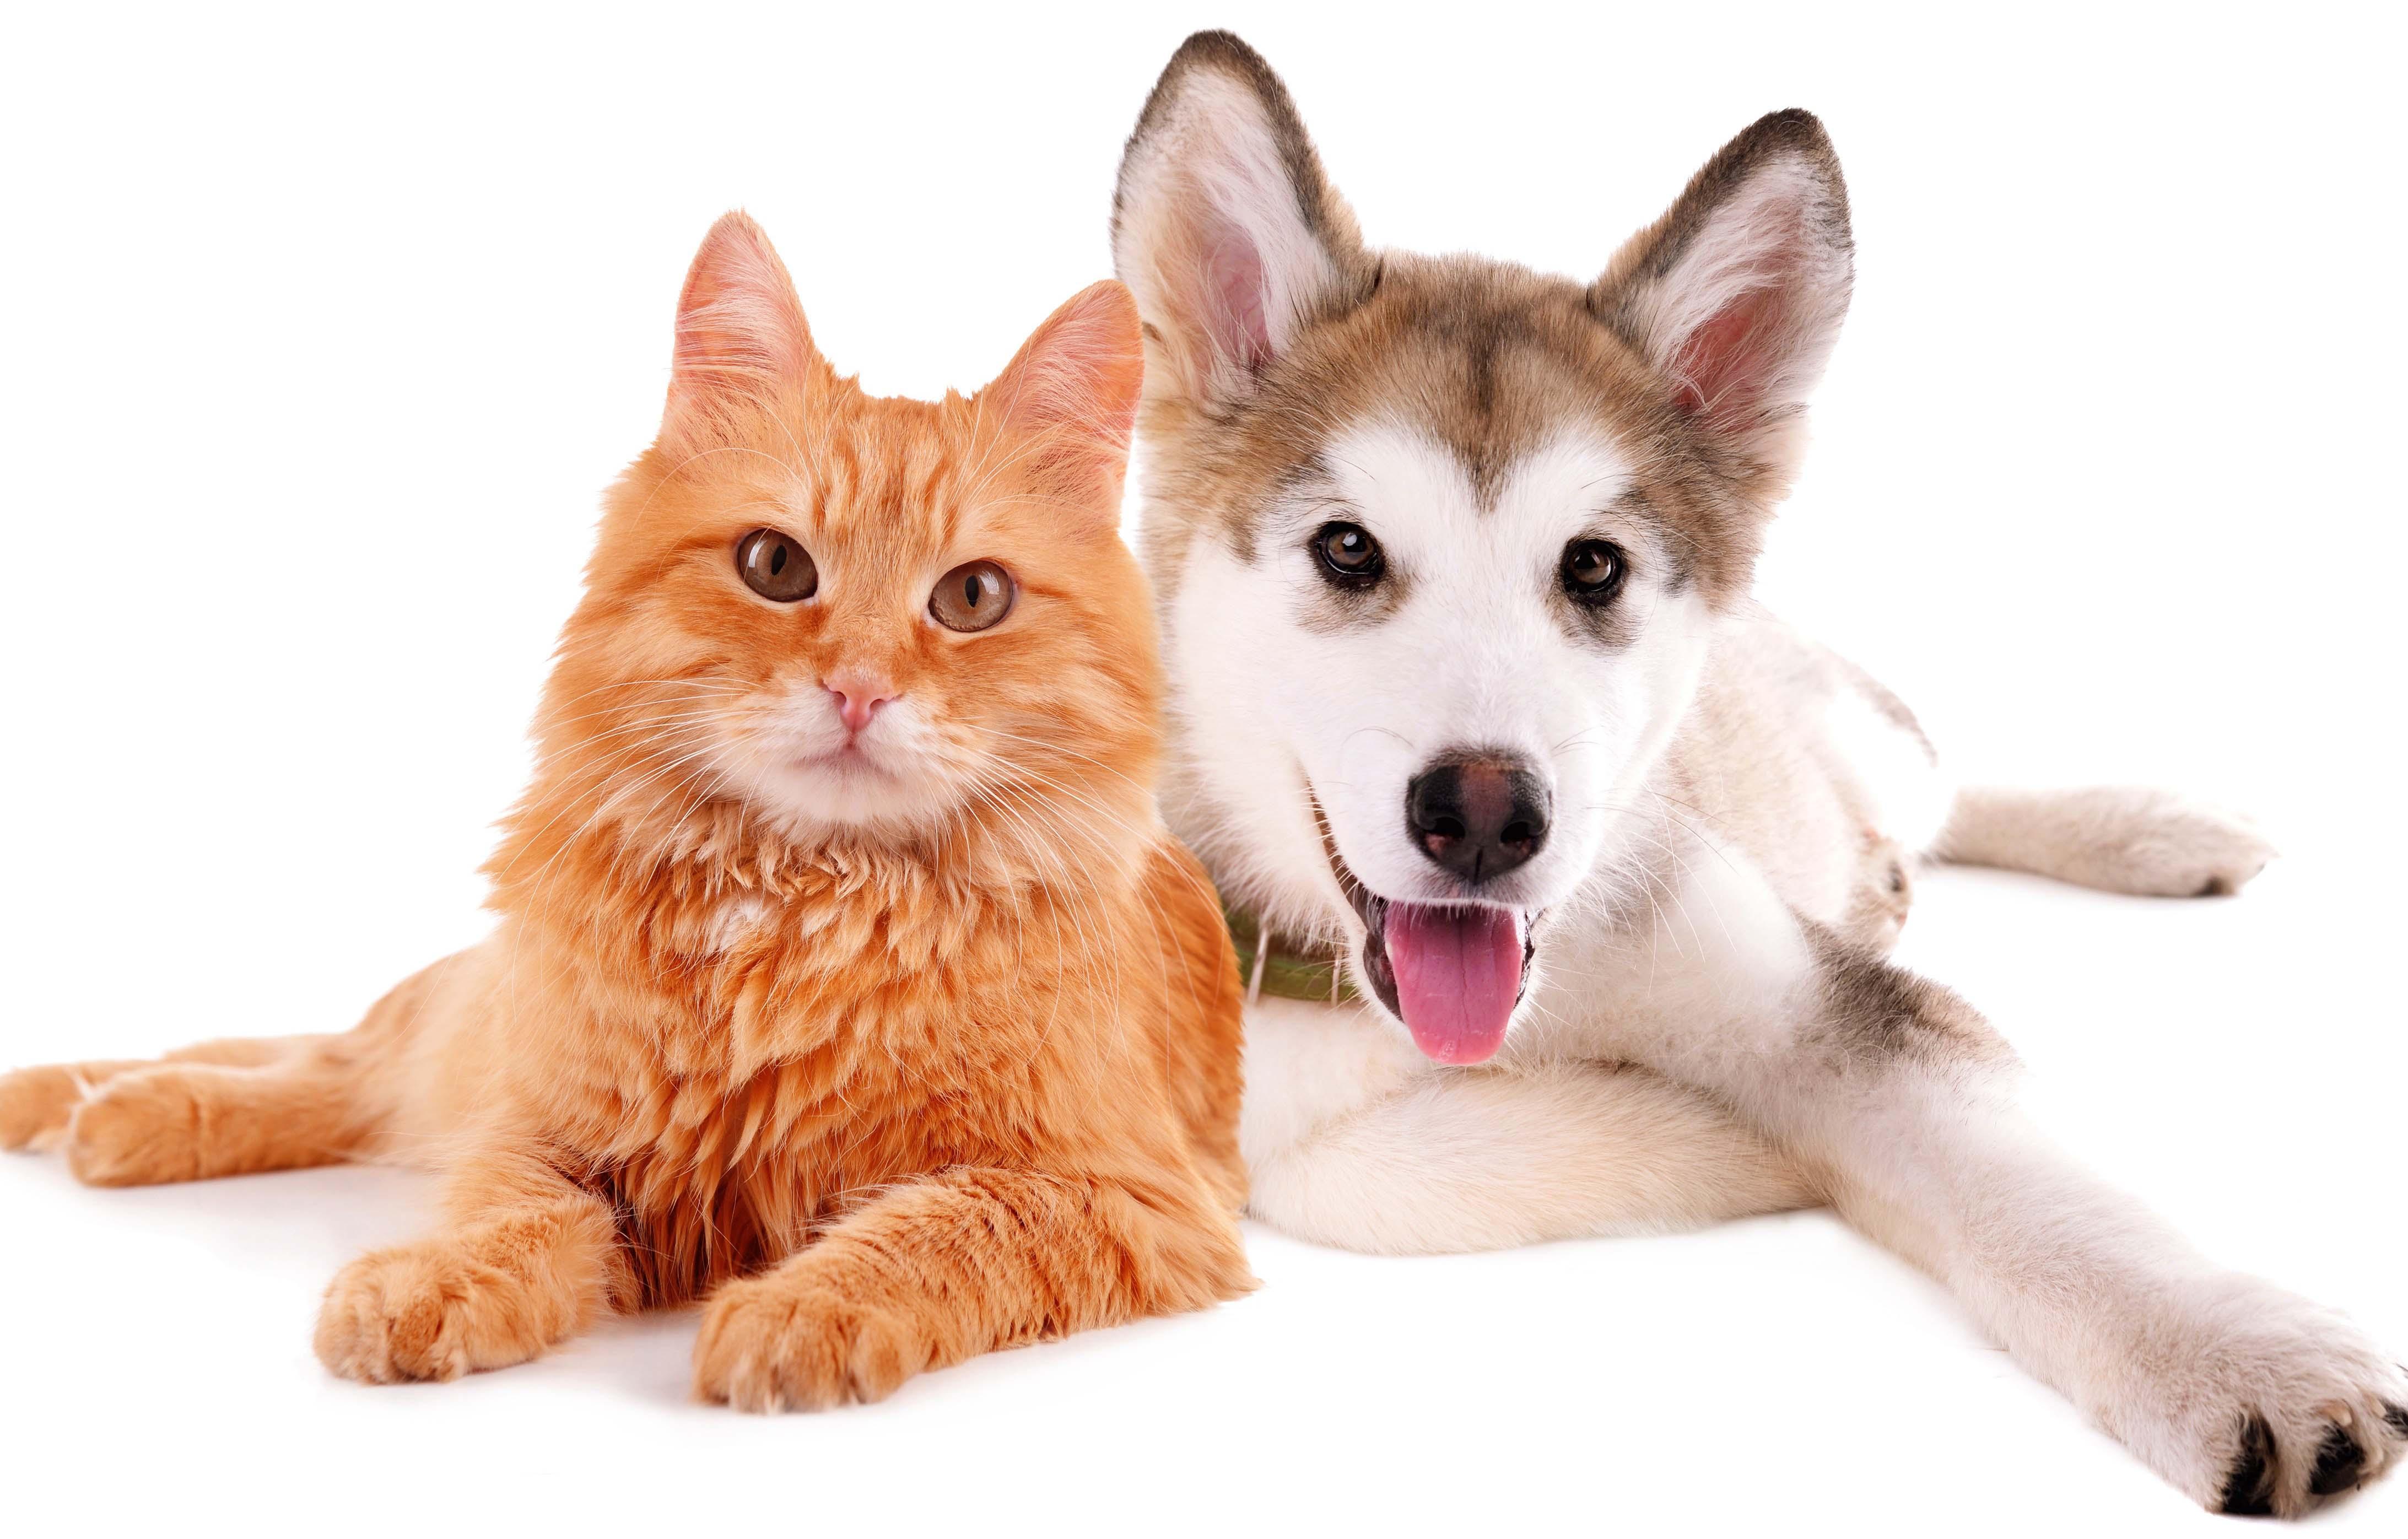 Selfish Cat Loyal Dog Funniest Wallpapers HD 4370x2793